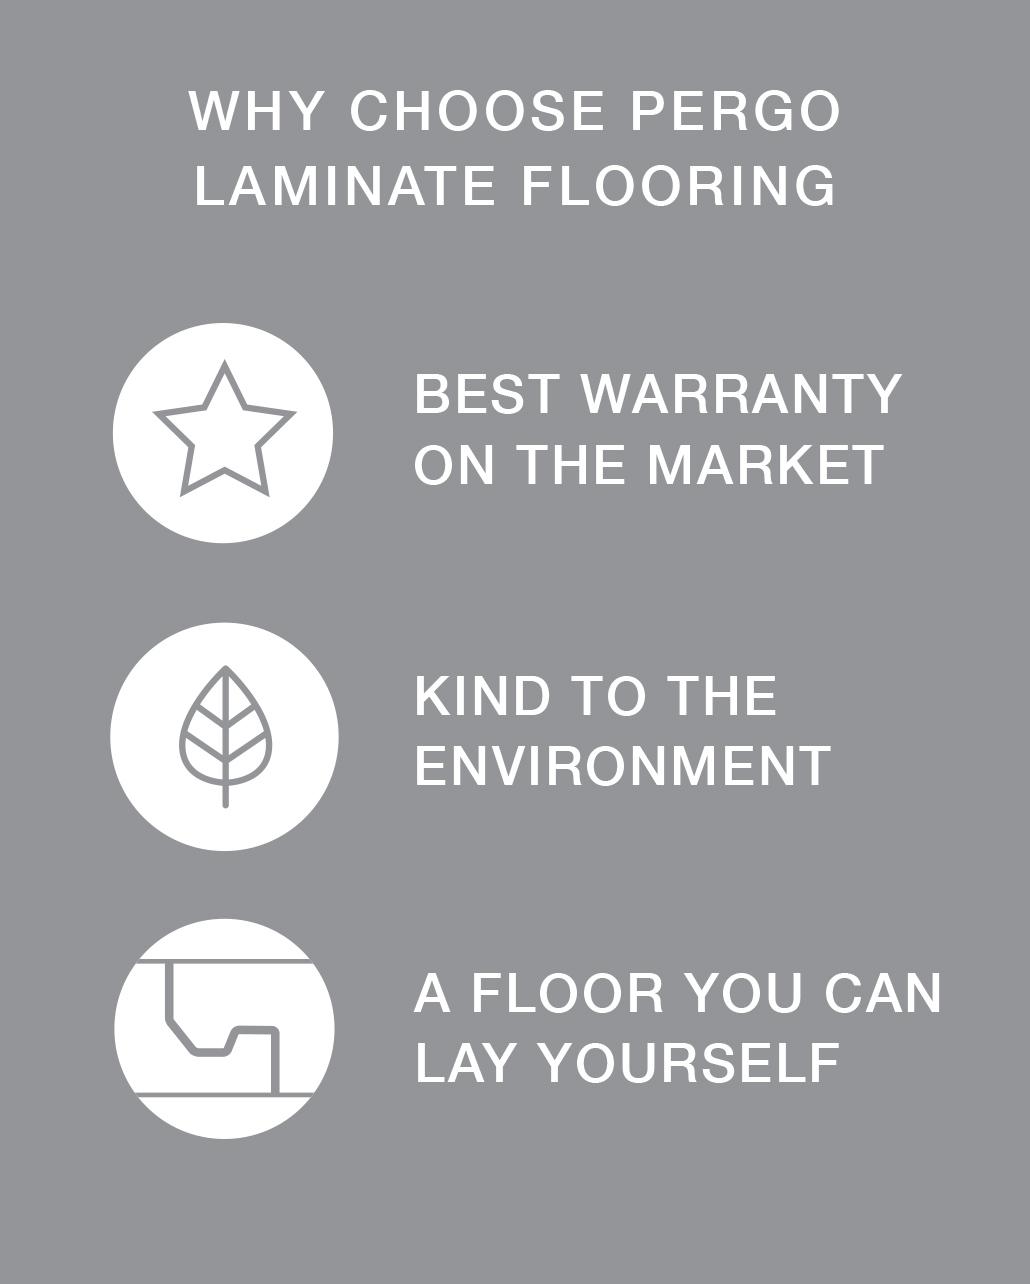 Pergo-infographics-the-value-of-a-good-laminate-flooring